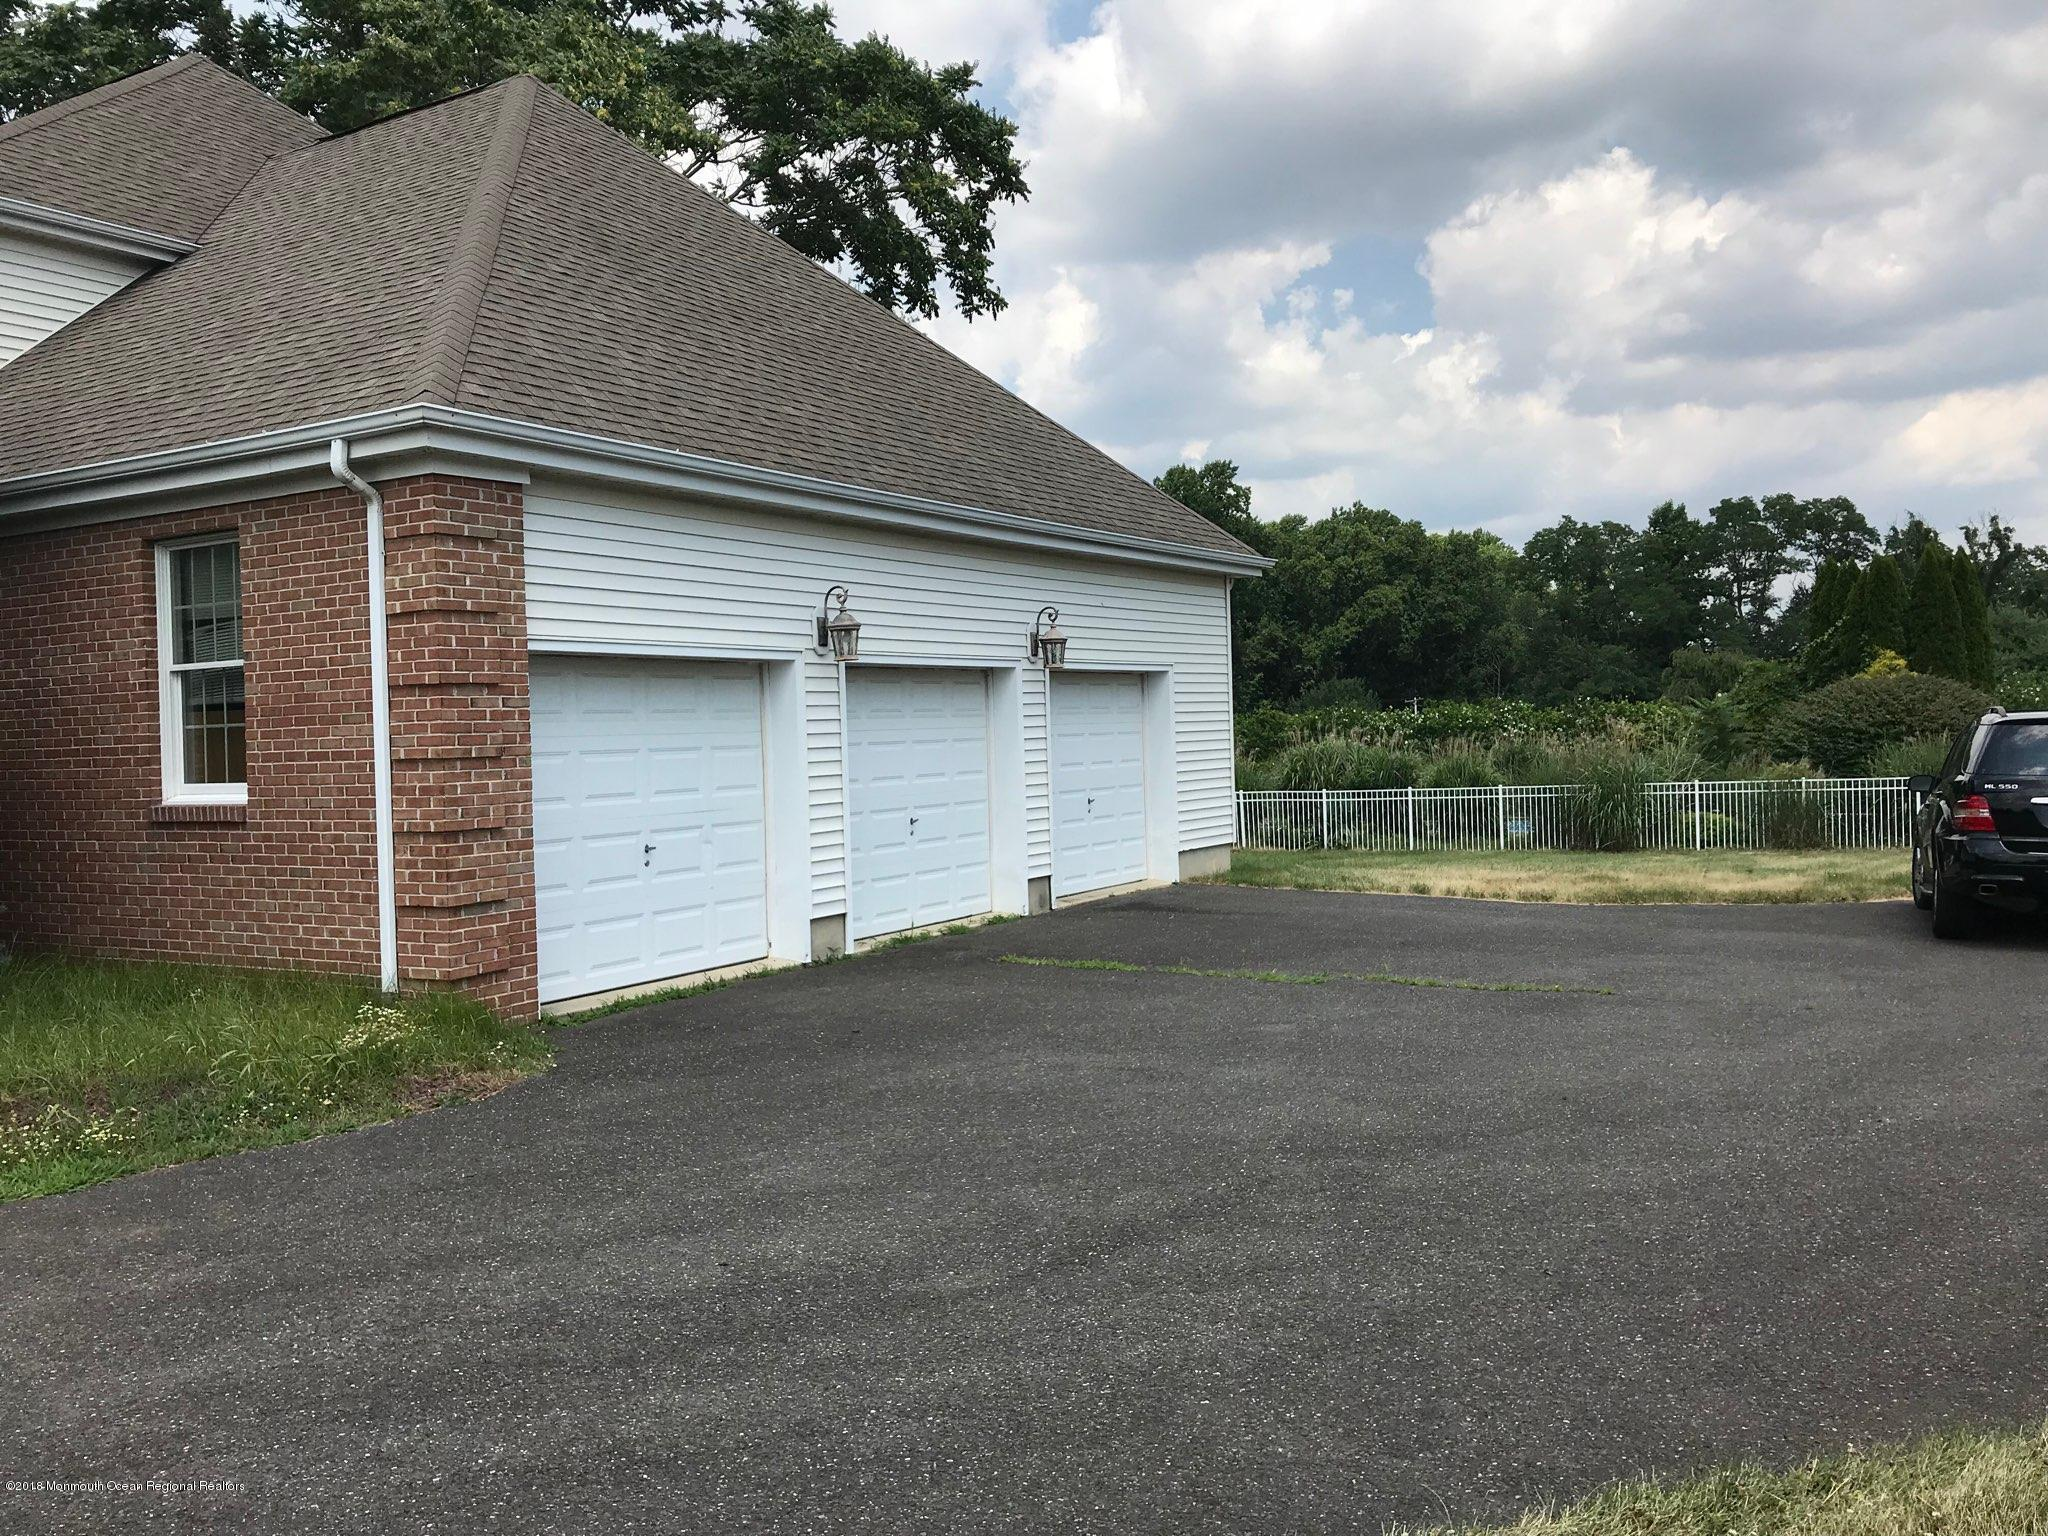 489 E Freehold Rd 3 Car Garage